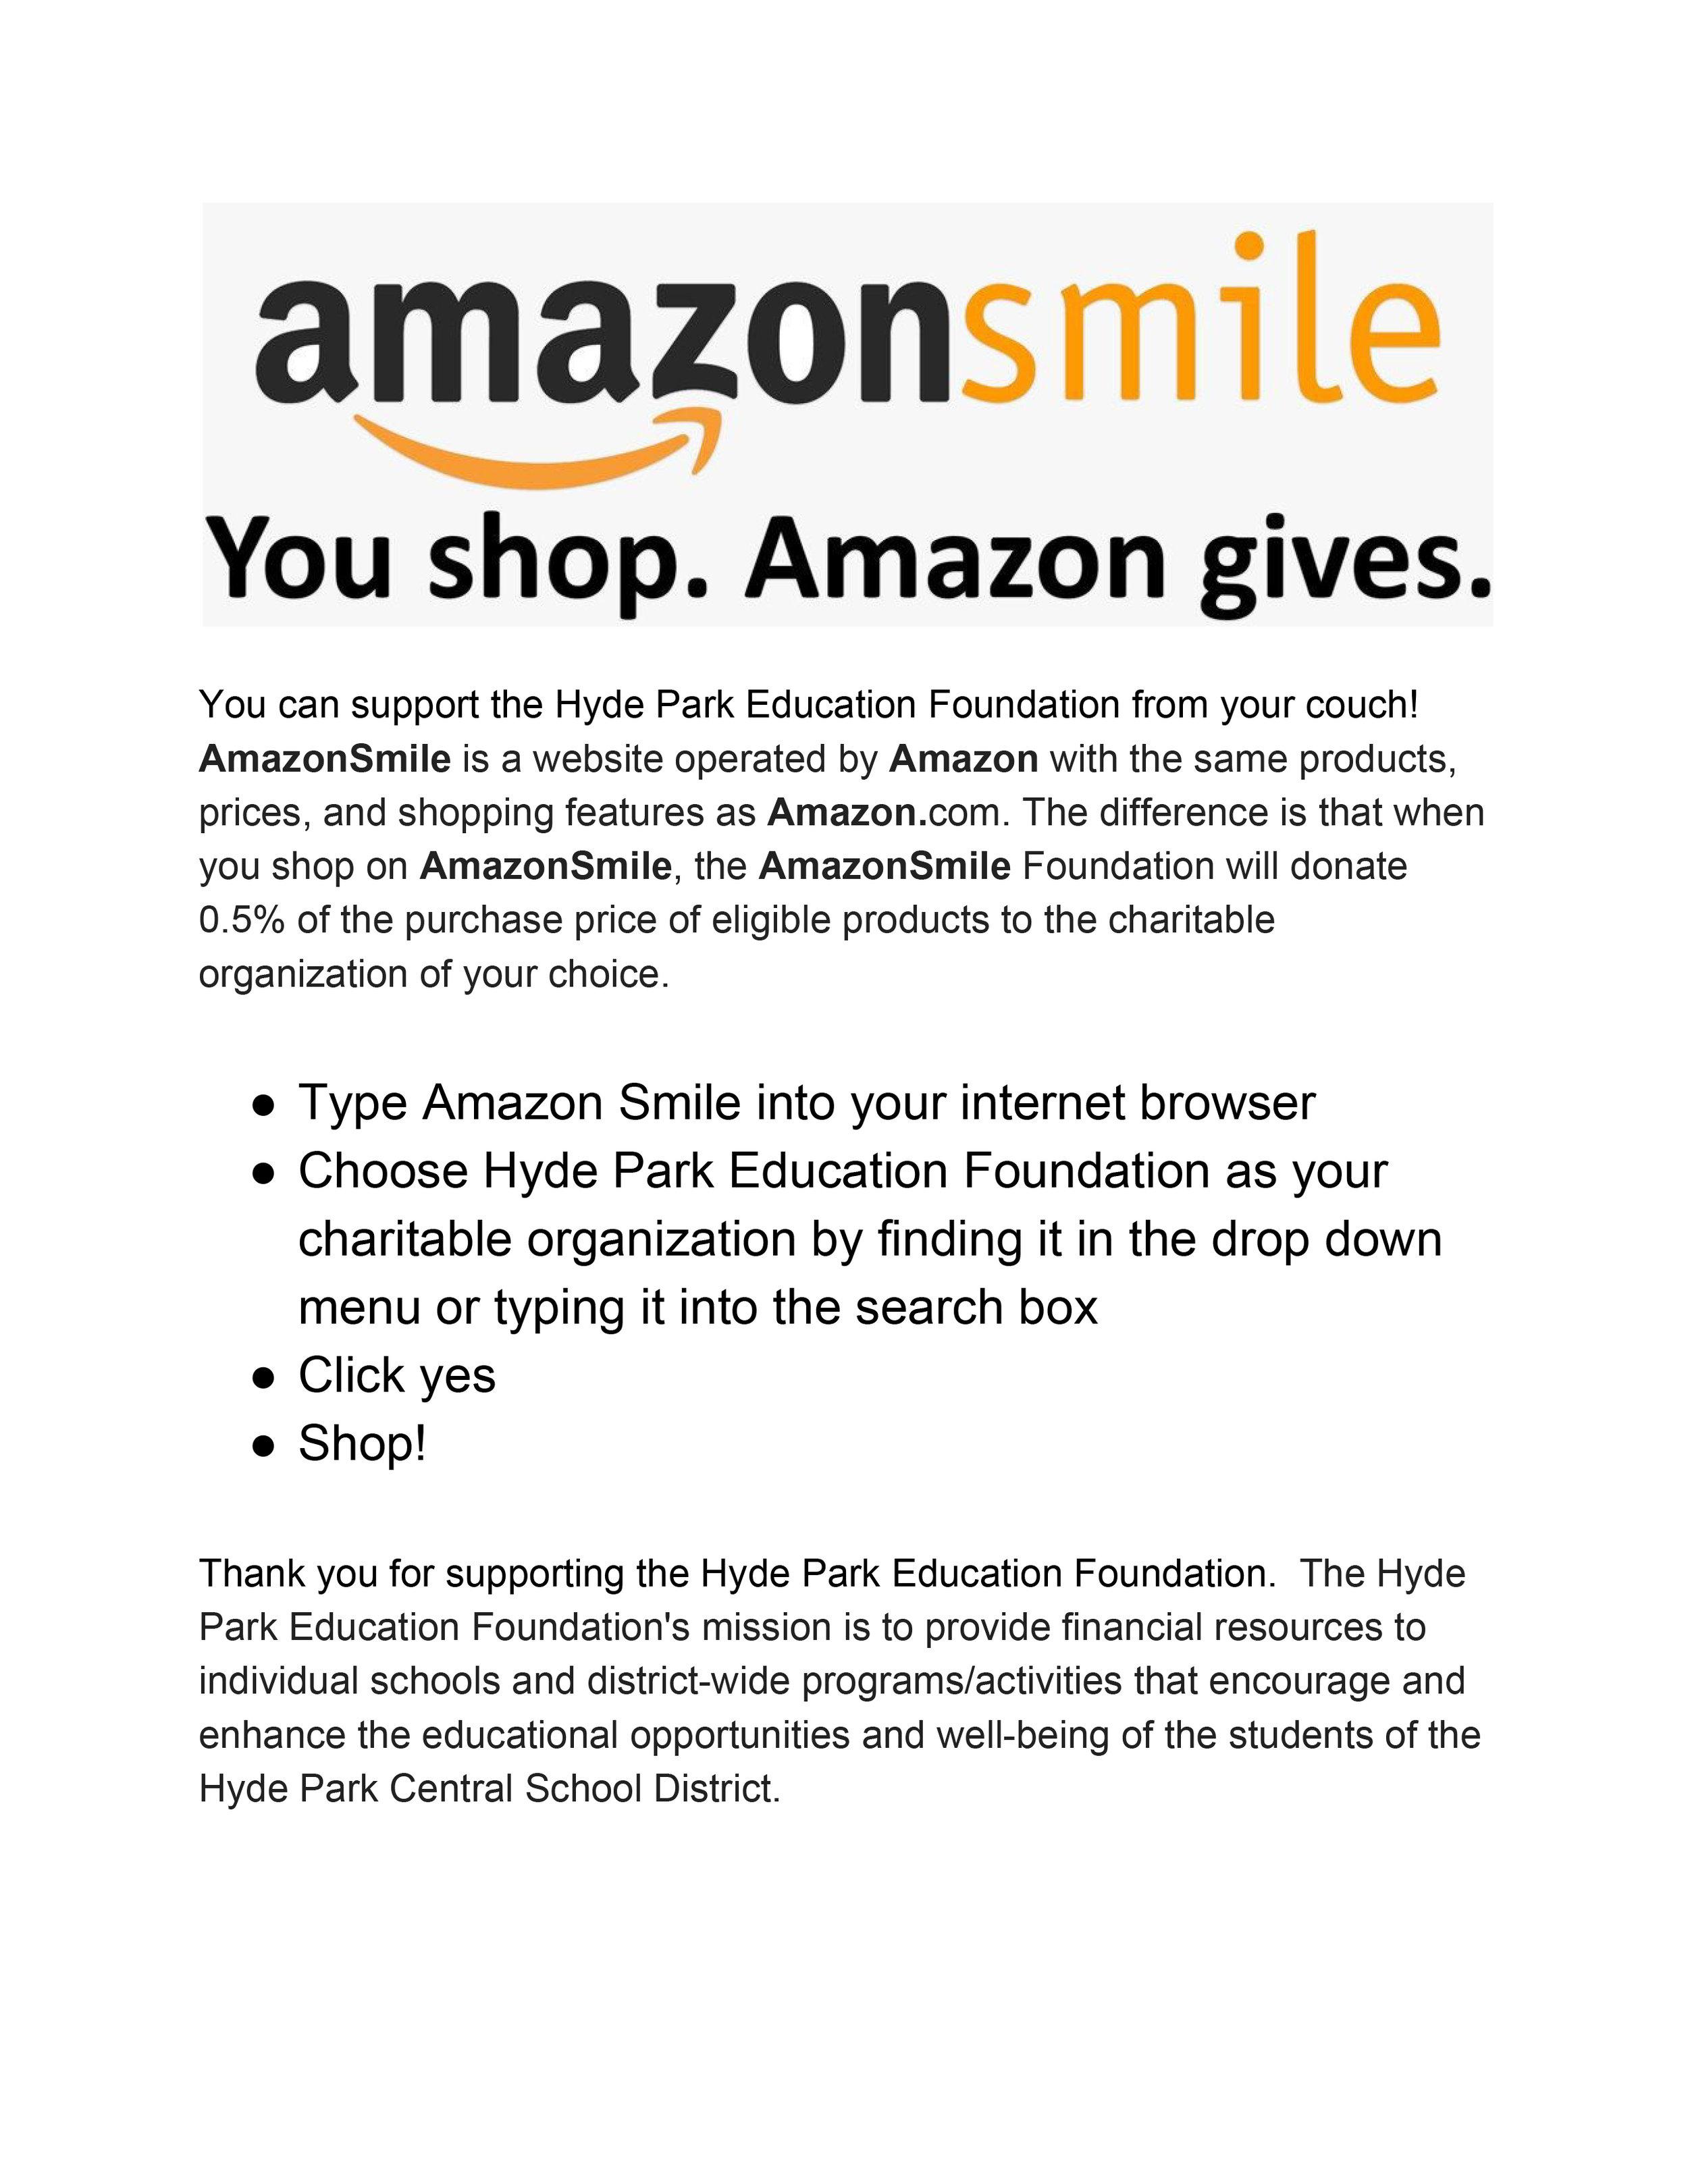 HPEF Amazon Smile